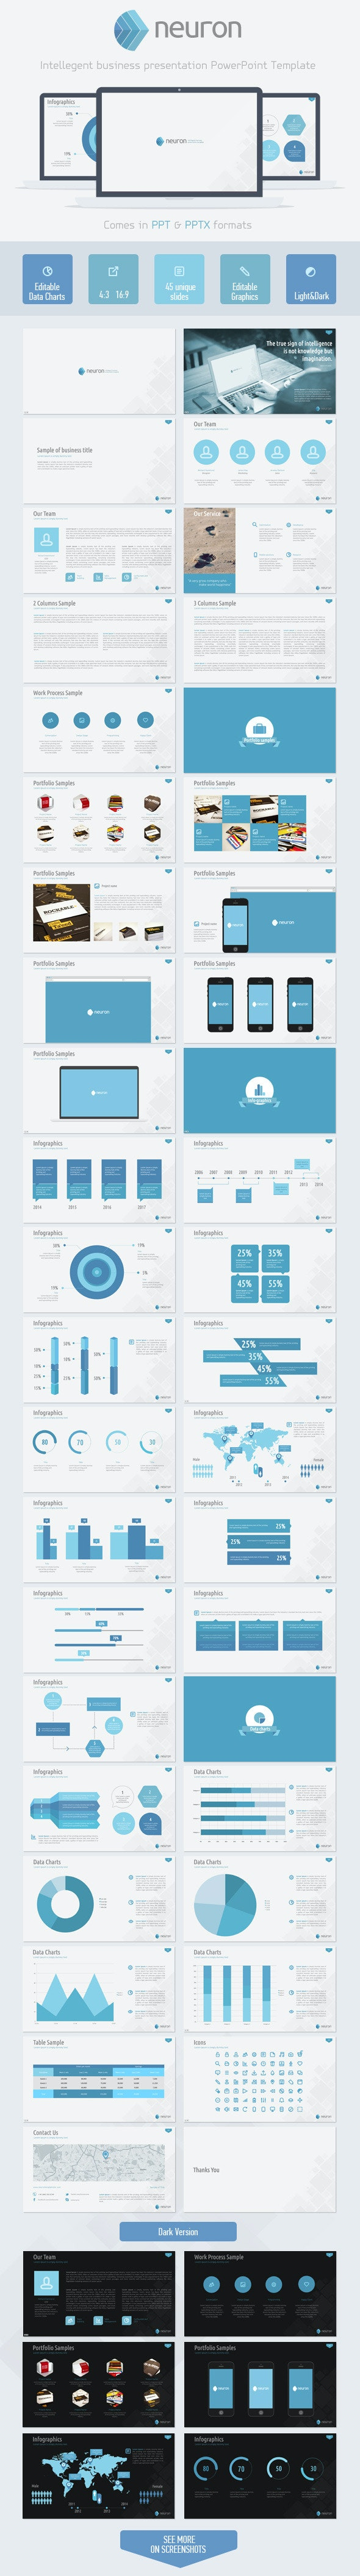 Neuron Powerpoint Presentation Template - Business PowerPoint Templates